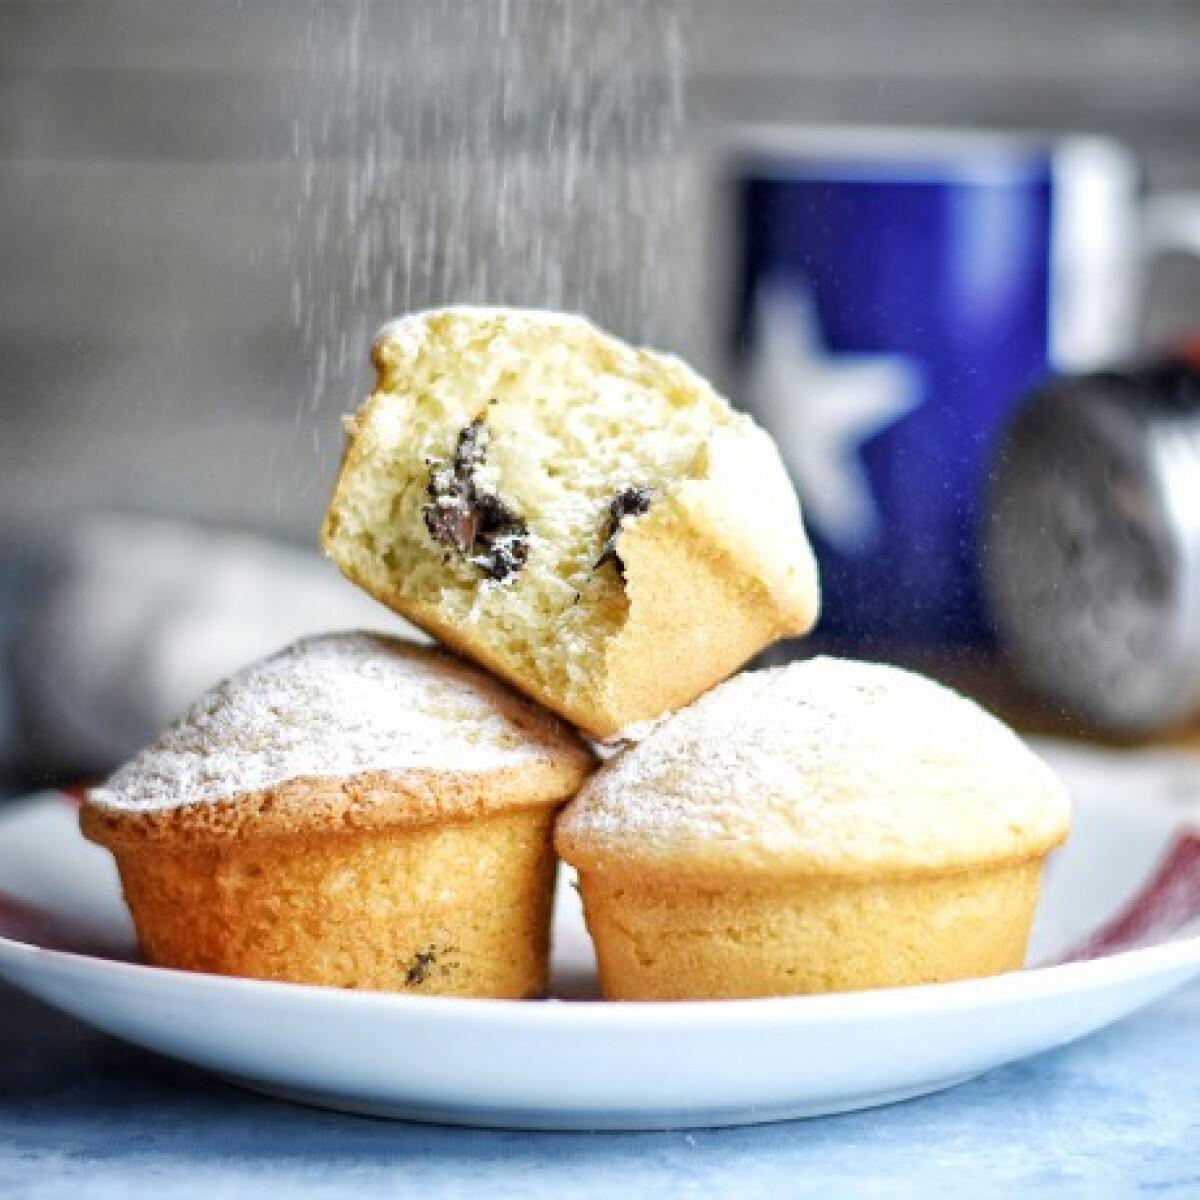 Ezen a képen: Gyors csokis muffin